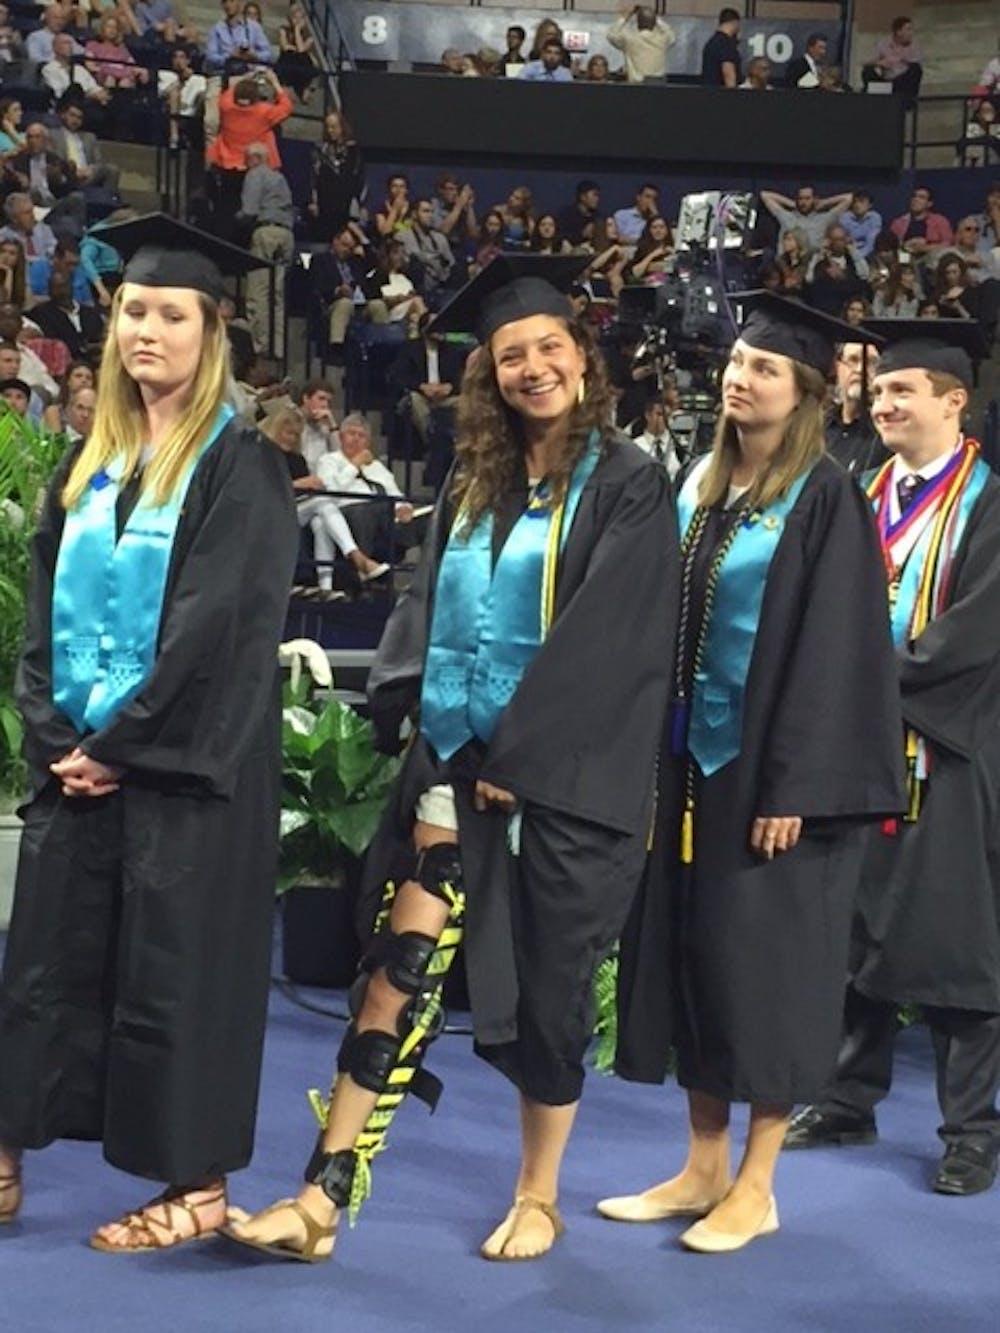 <p>Kobb, walks with her leg brace&nbsp;amongst fellow Jepson seniors at graduation on May 8, 2016.</p>